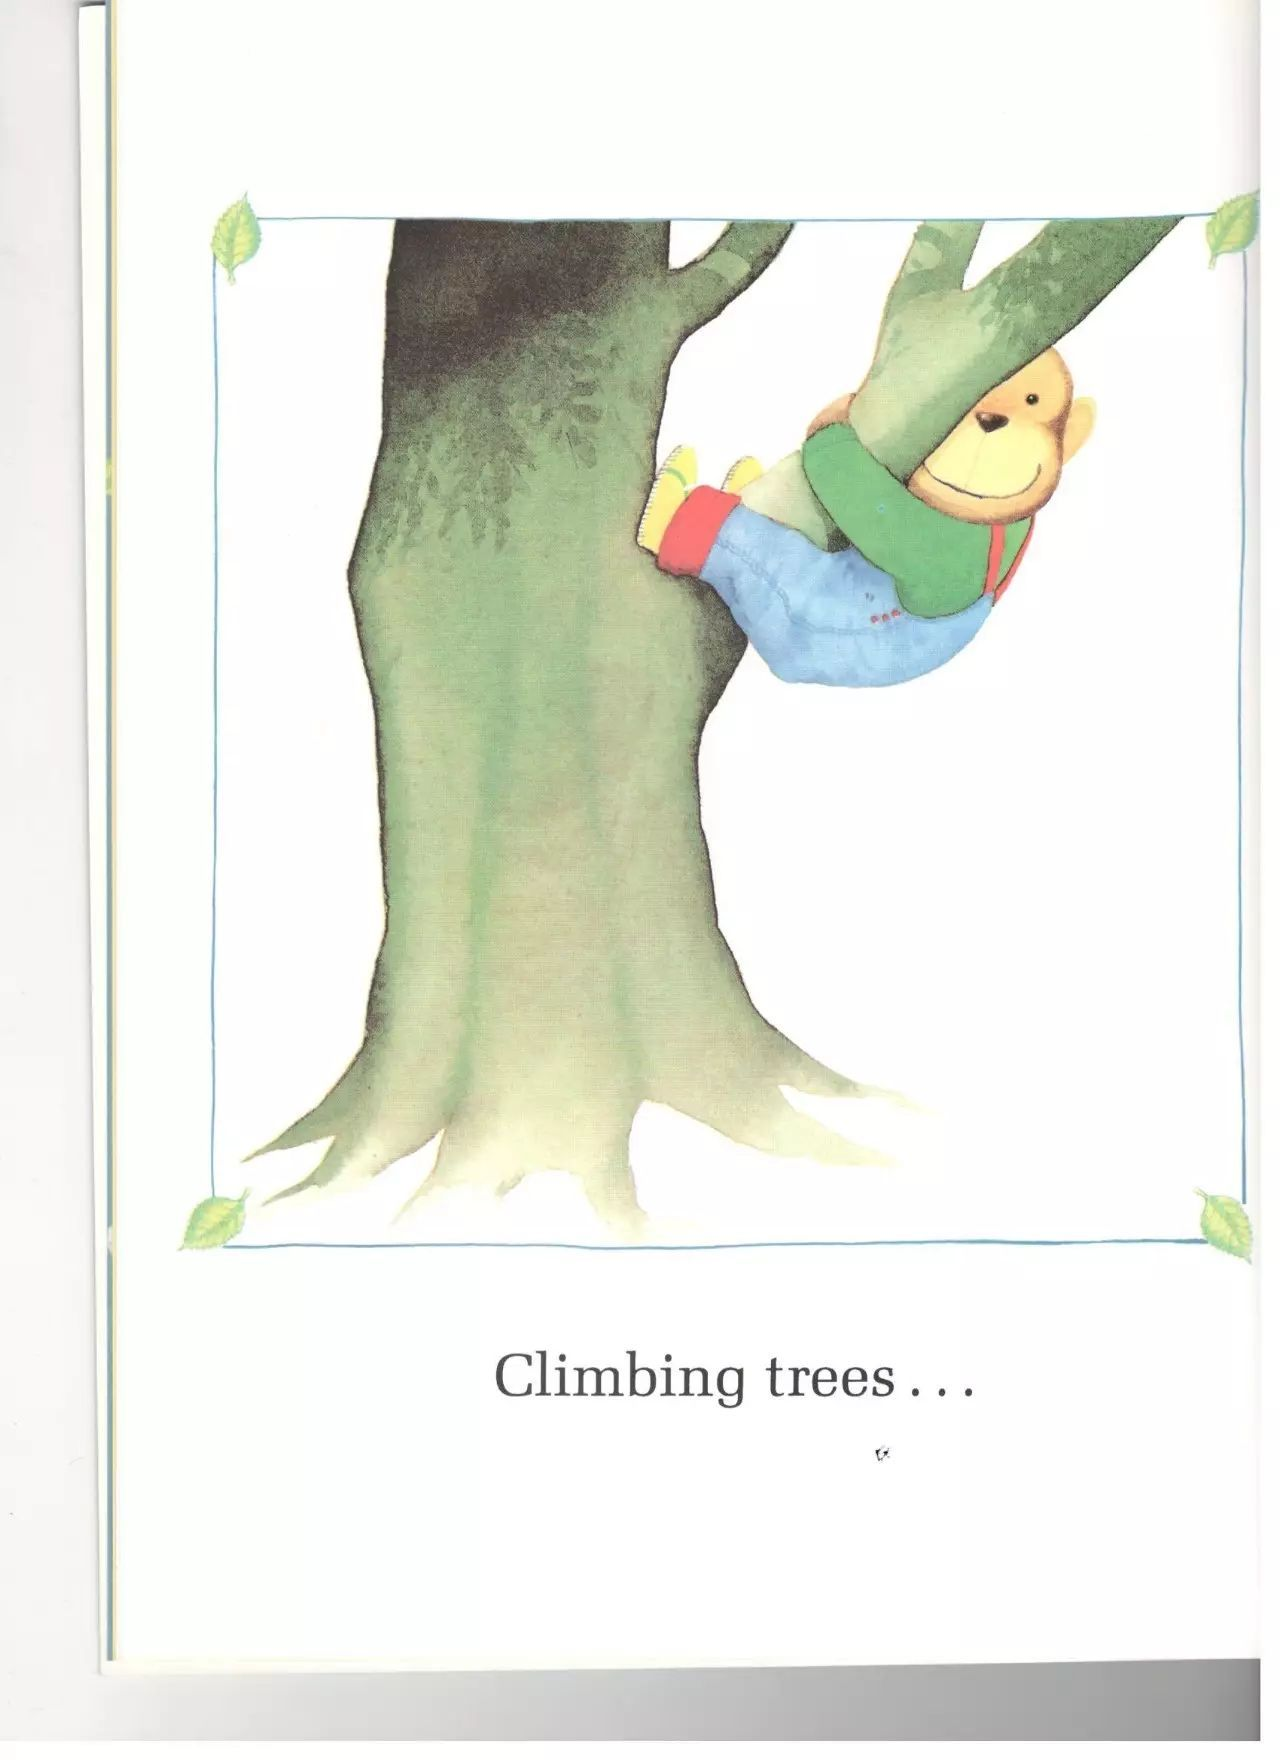 Things I Like 我喜欢的一切 -第7张图片-58绘本网-专注儿童绘本批发销售。